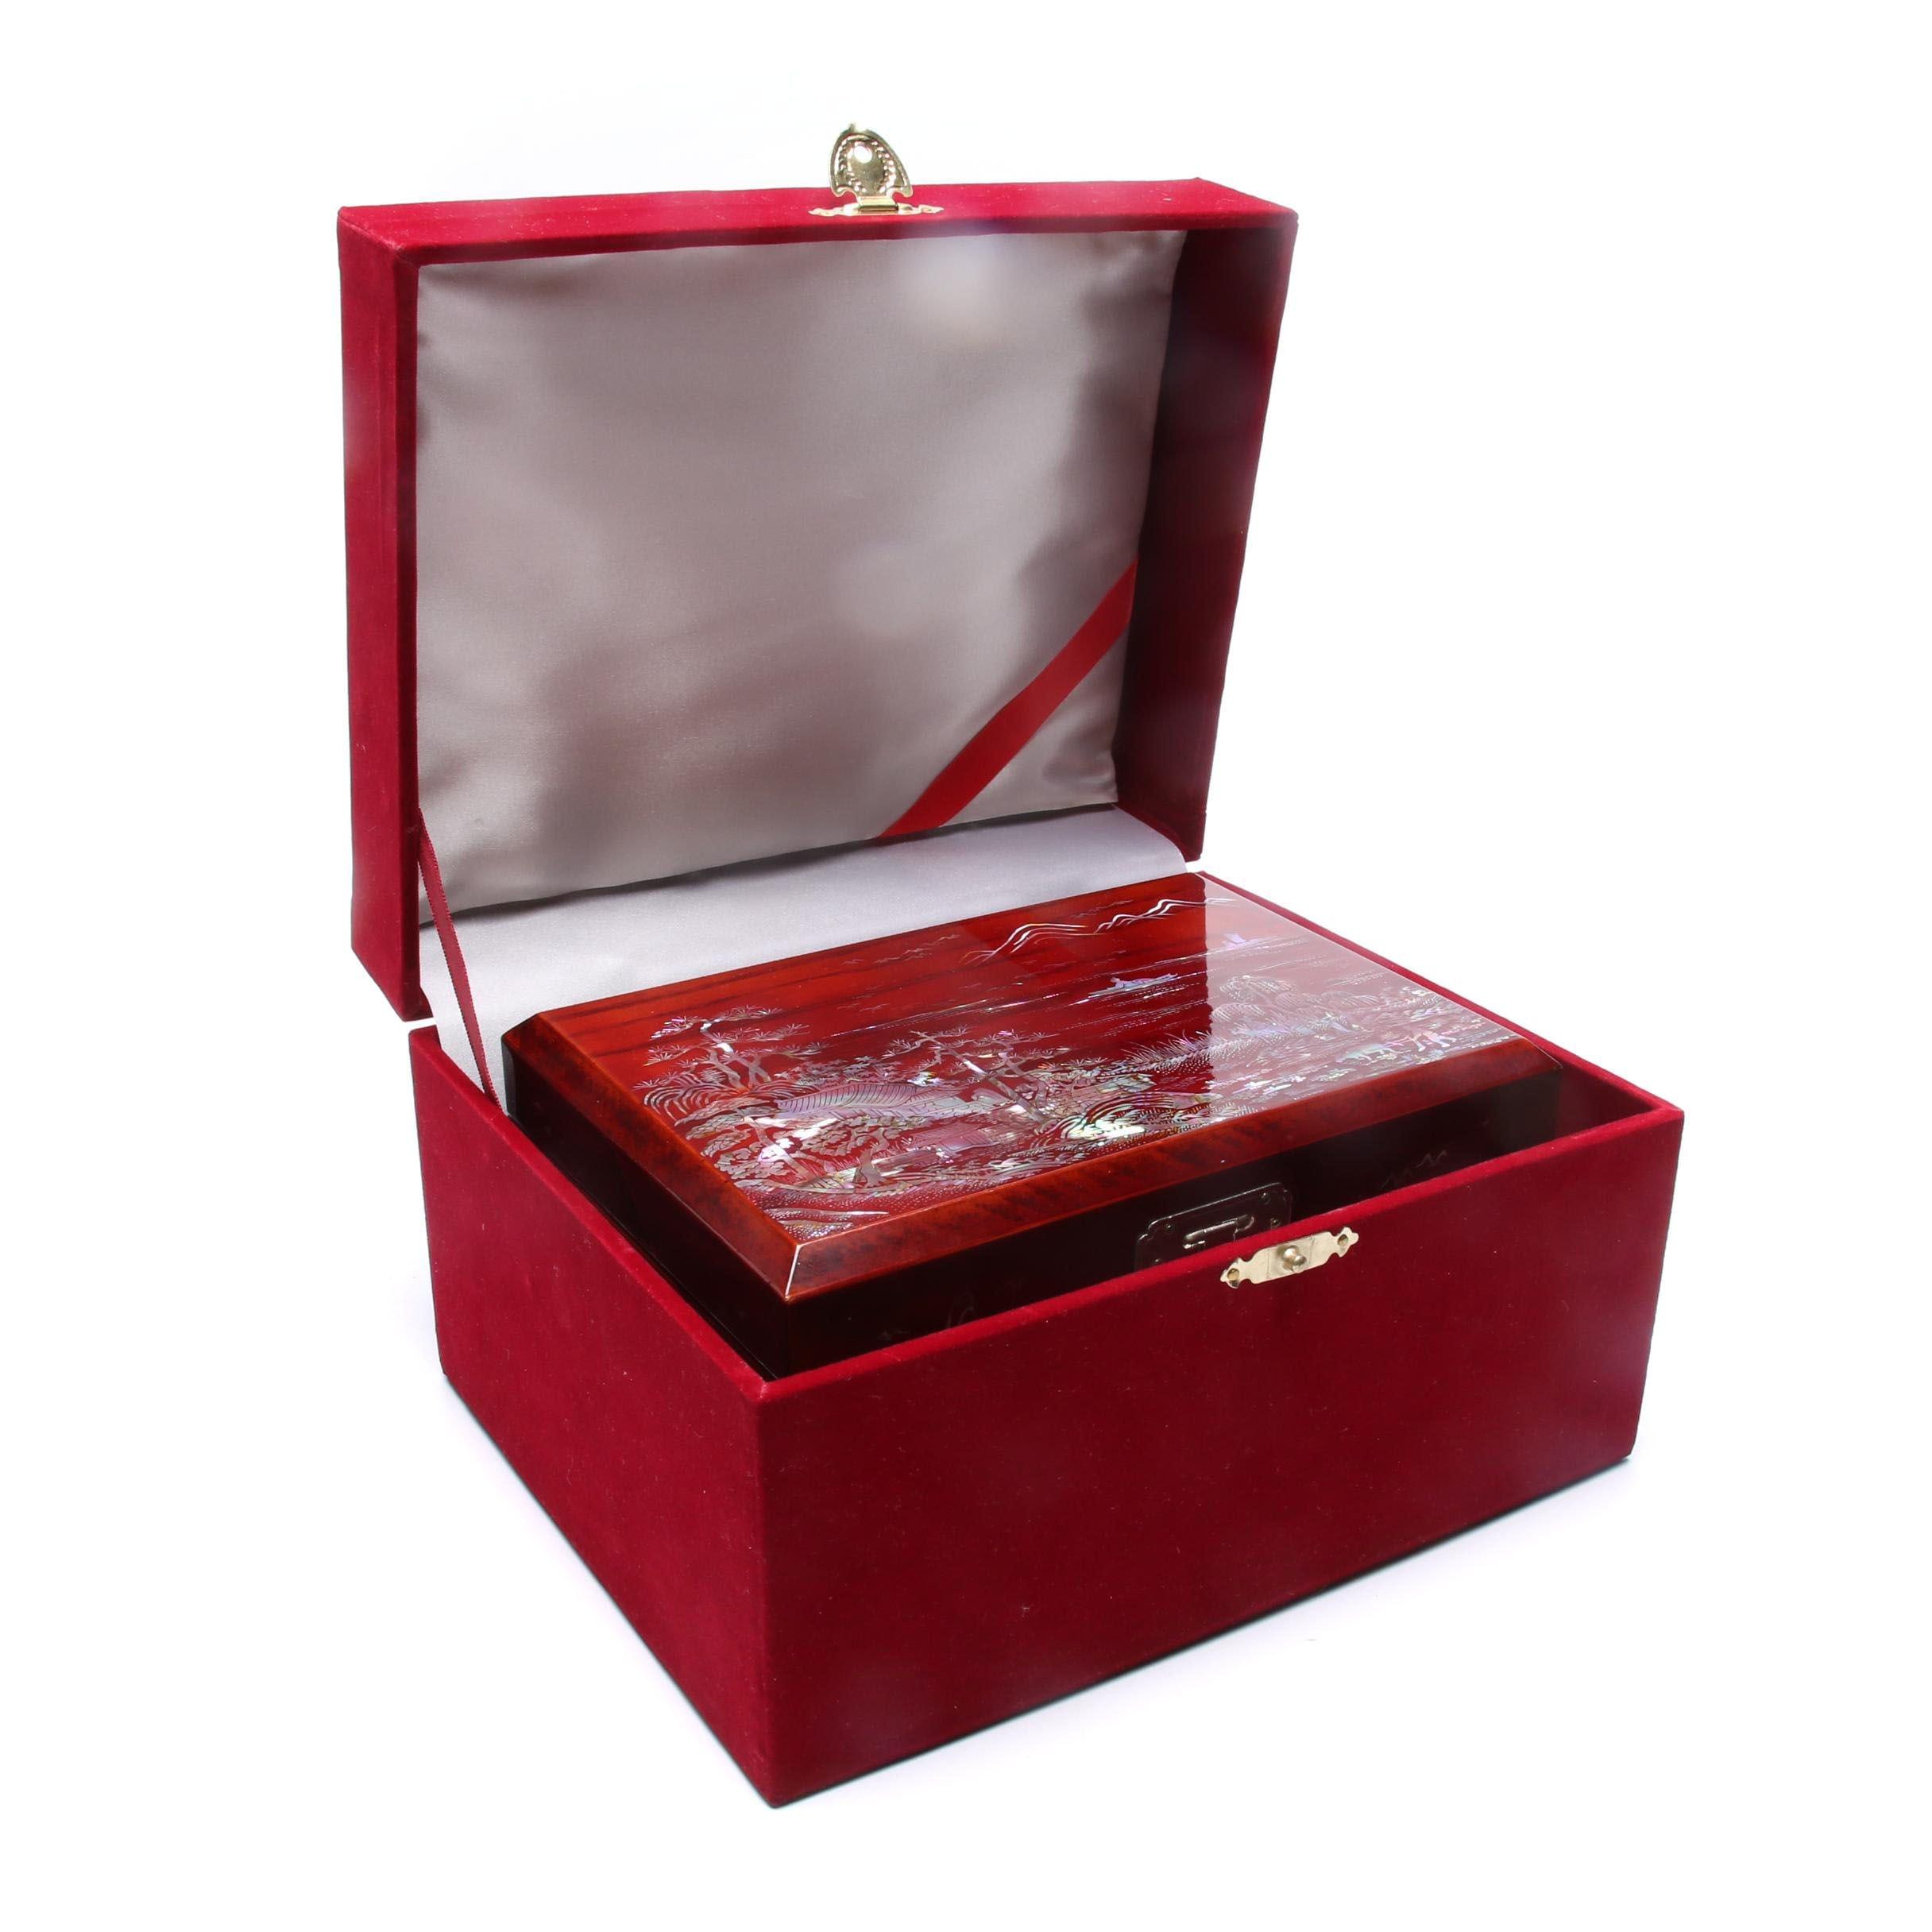 Chinese Jewelry Box with Abalone Inlay